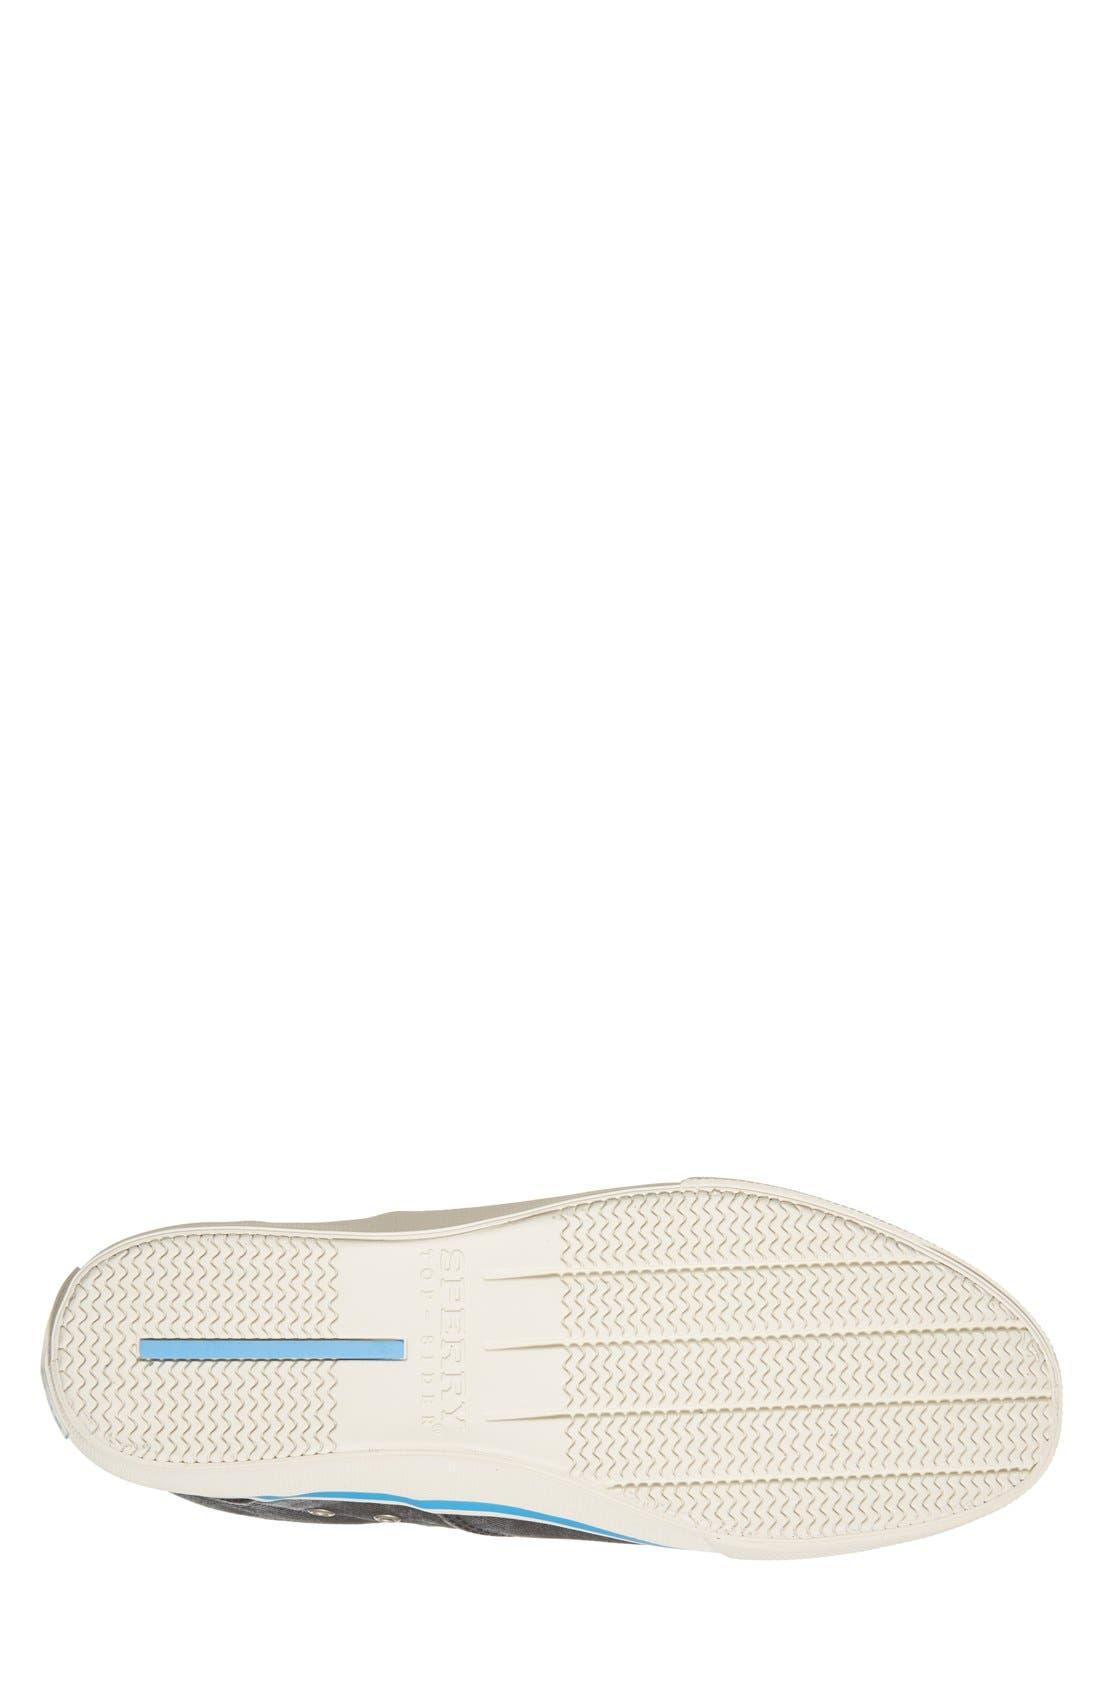 Alternate Image 4  - Sperry Top-Sider® 'Striper CVO' Sneaker (Men)